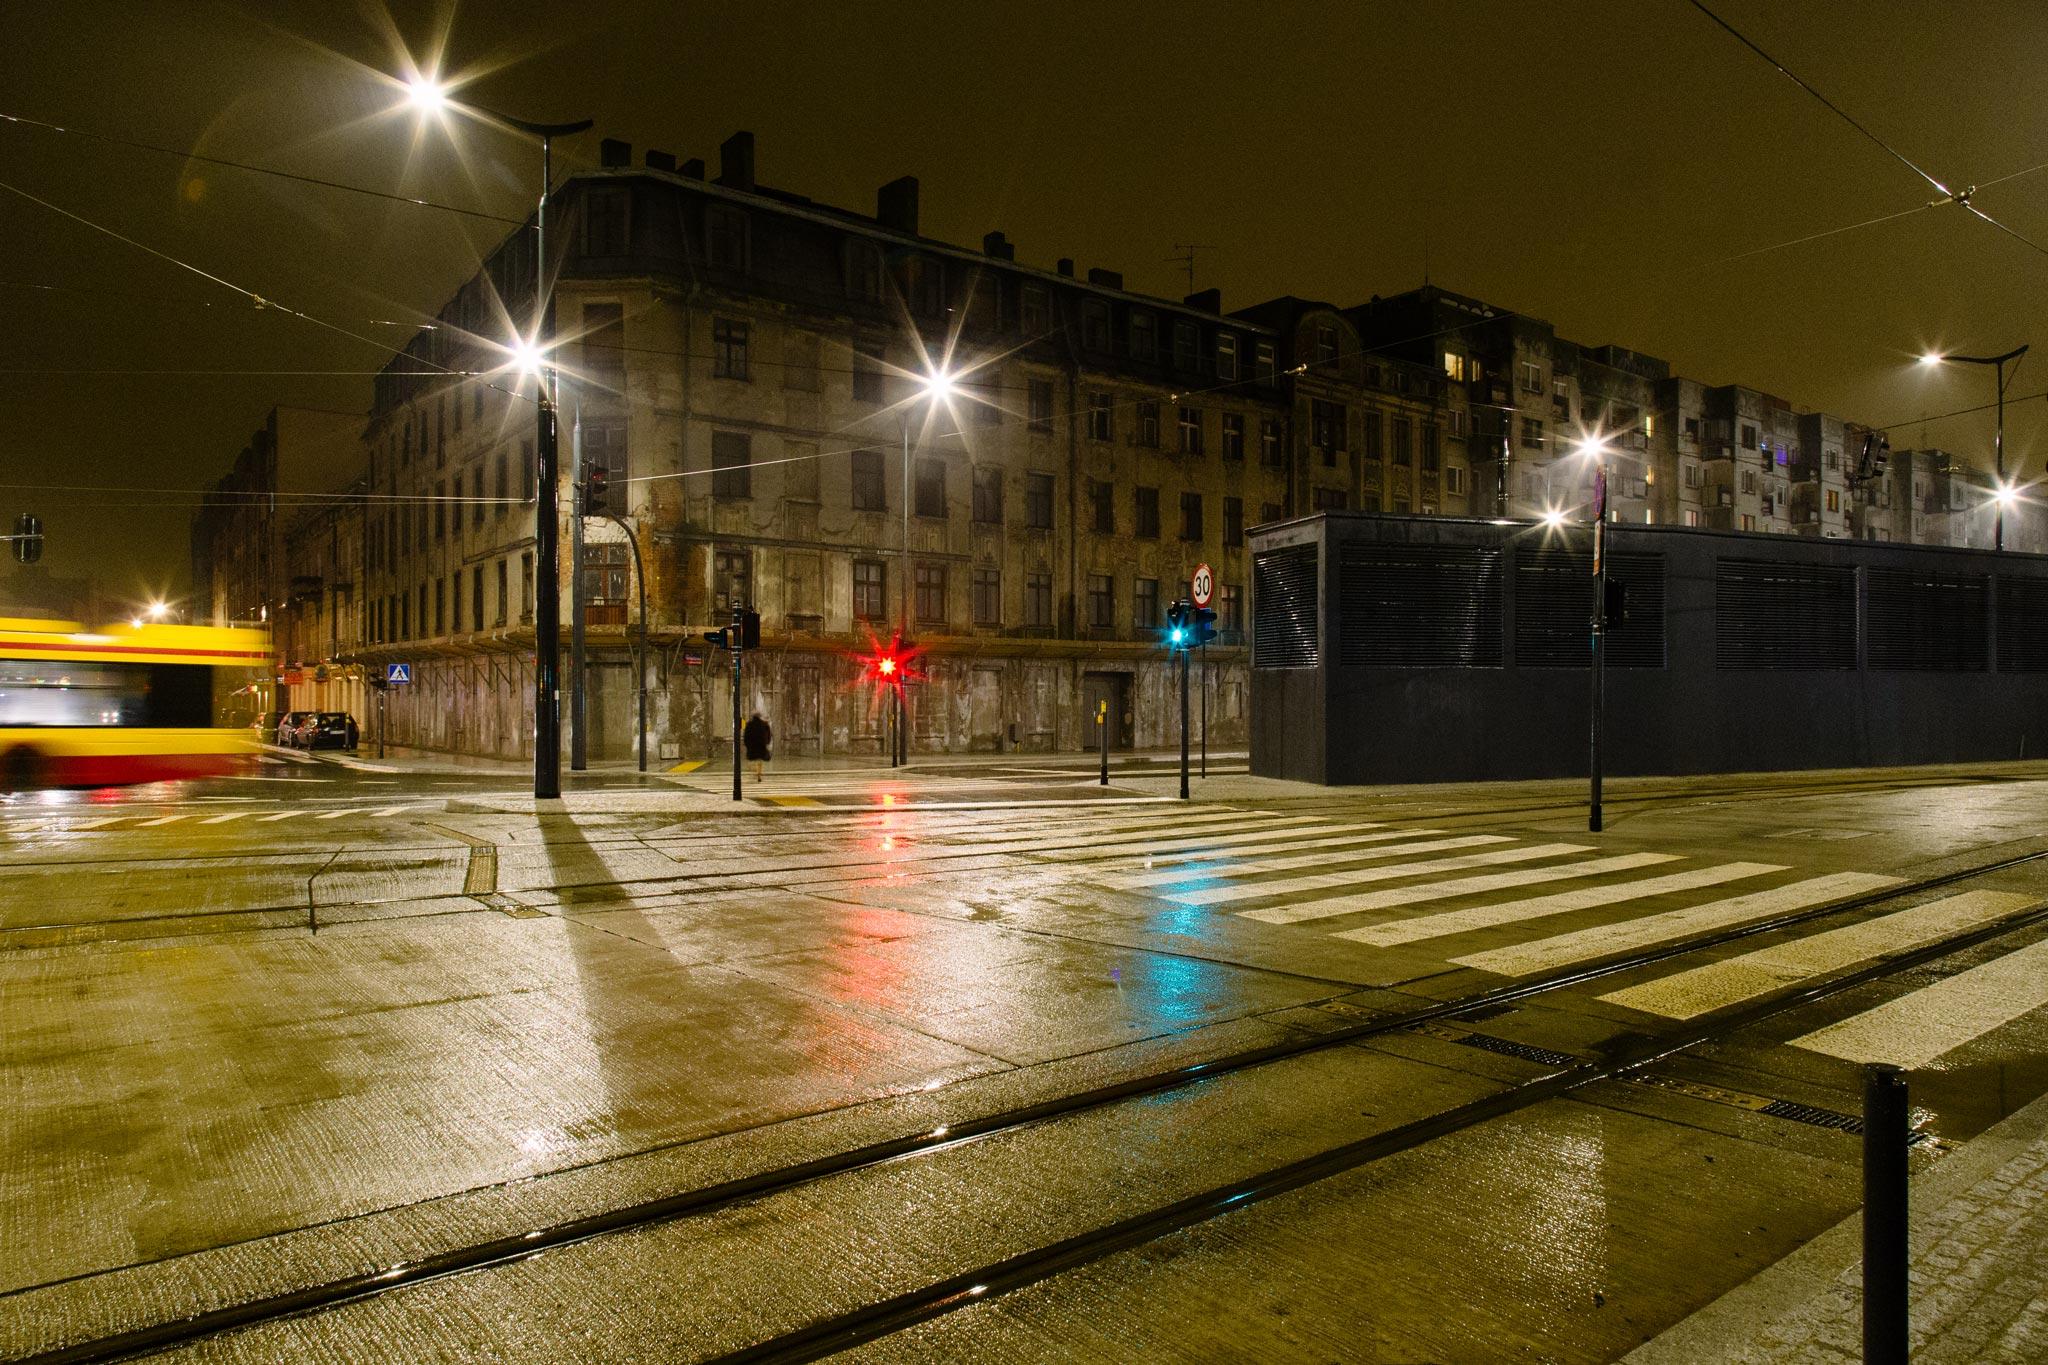 LodzRainyStreet